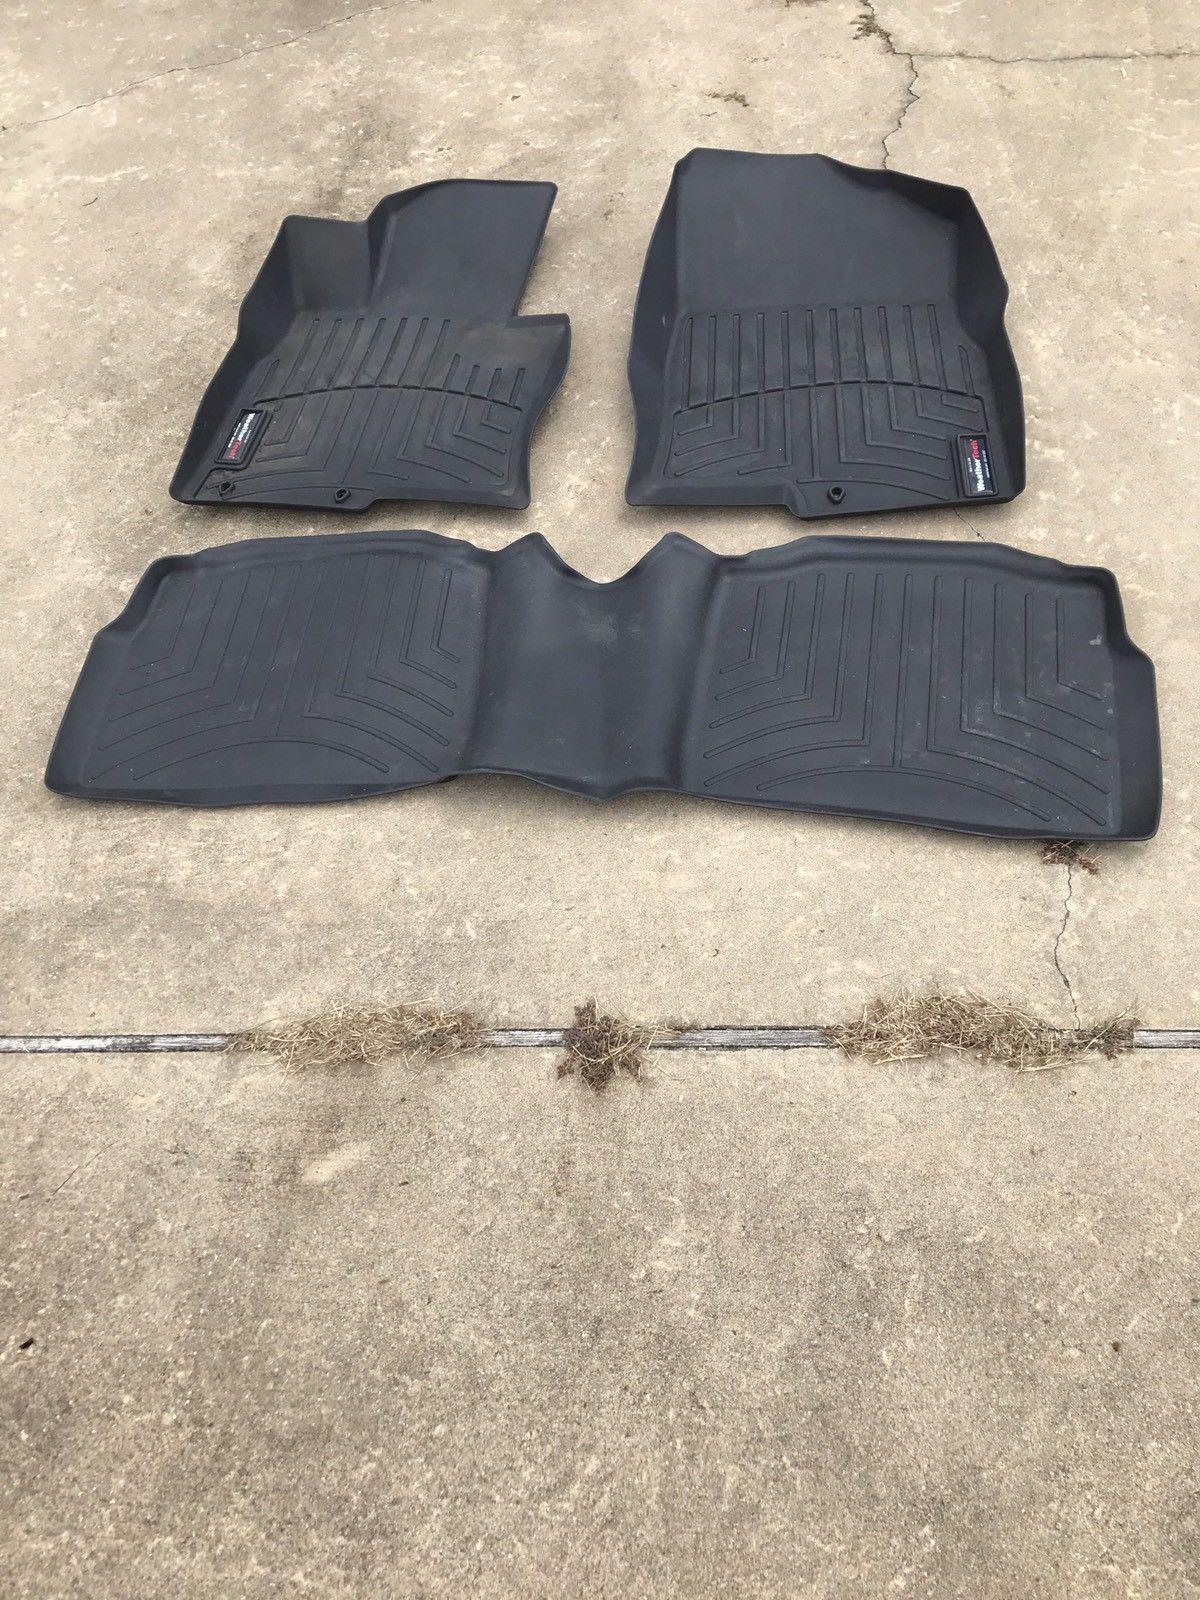 s hyundai and car review test photo sonata original mats floor reviews driver